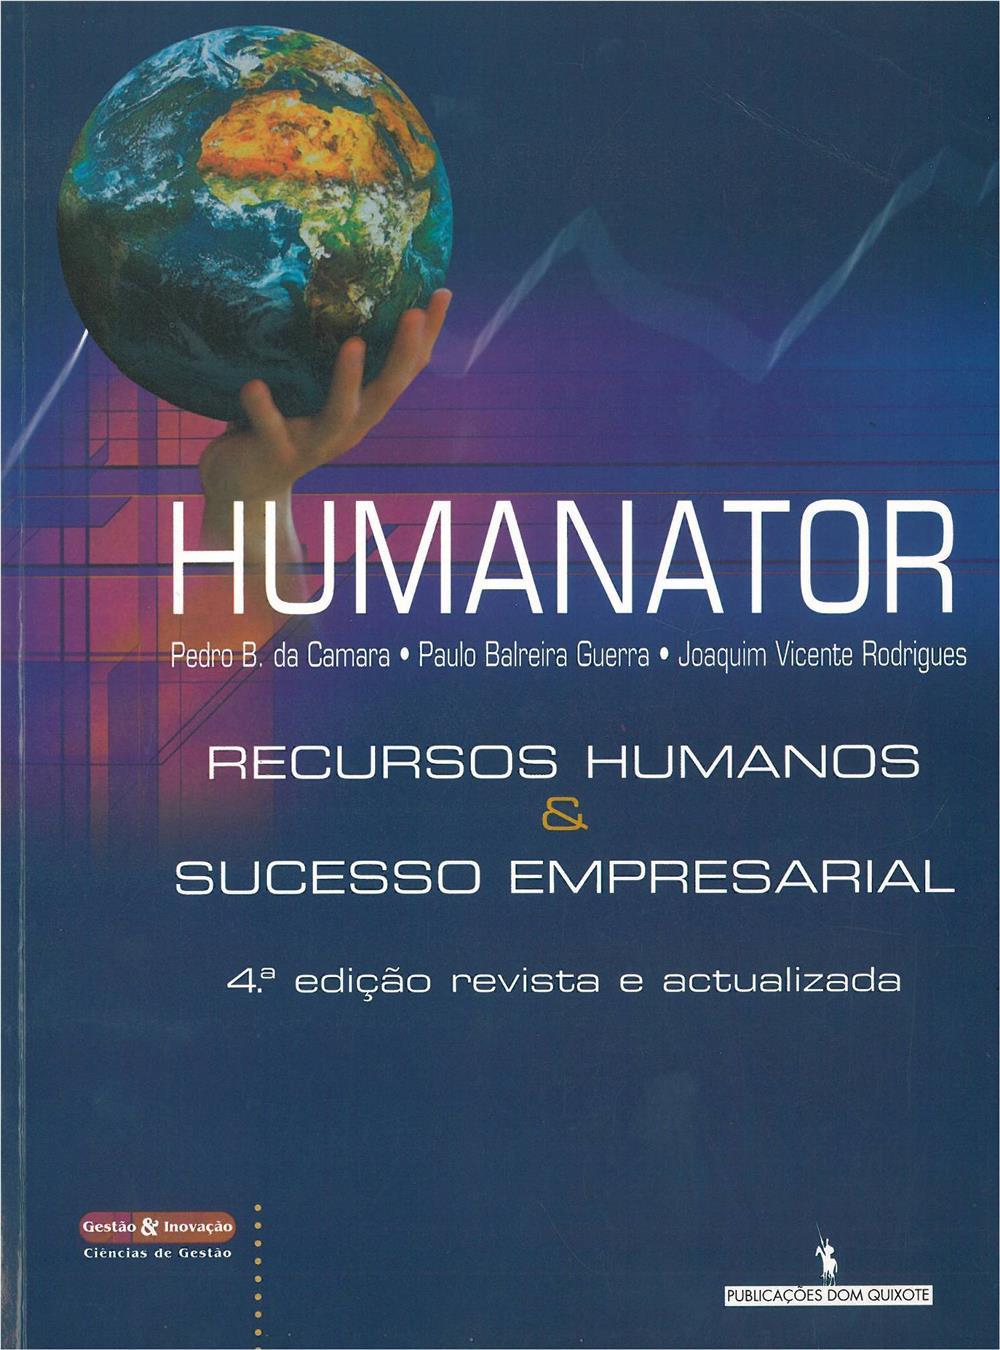 Humanator 2001_.jpg